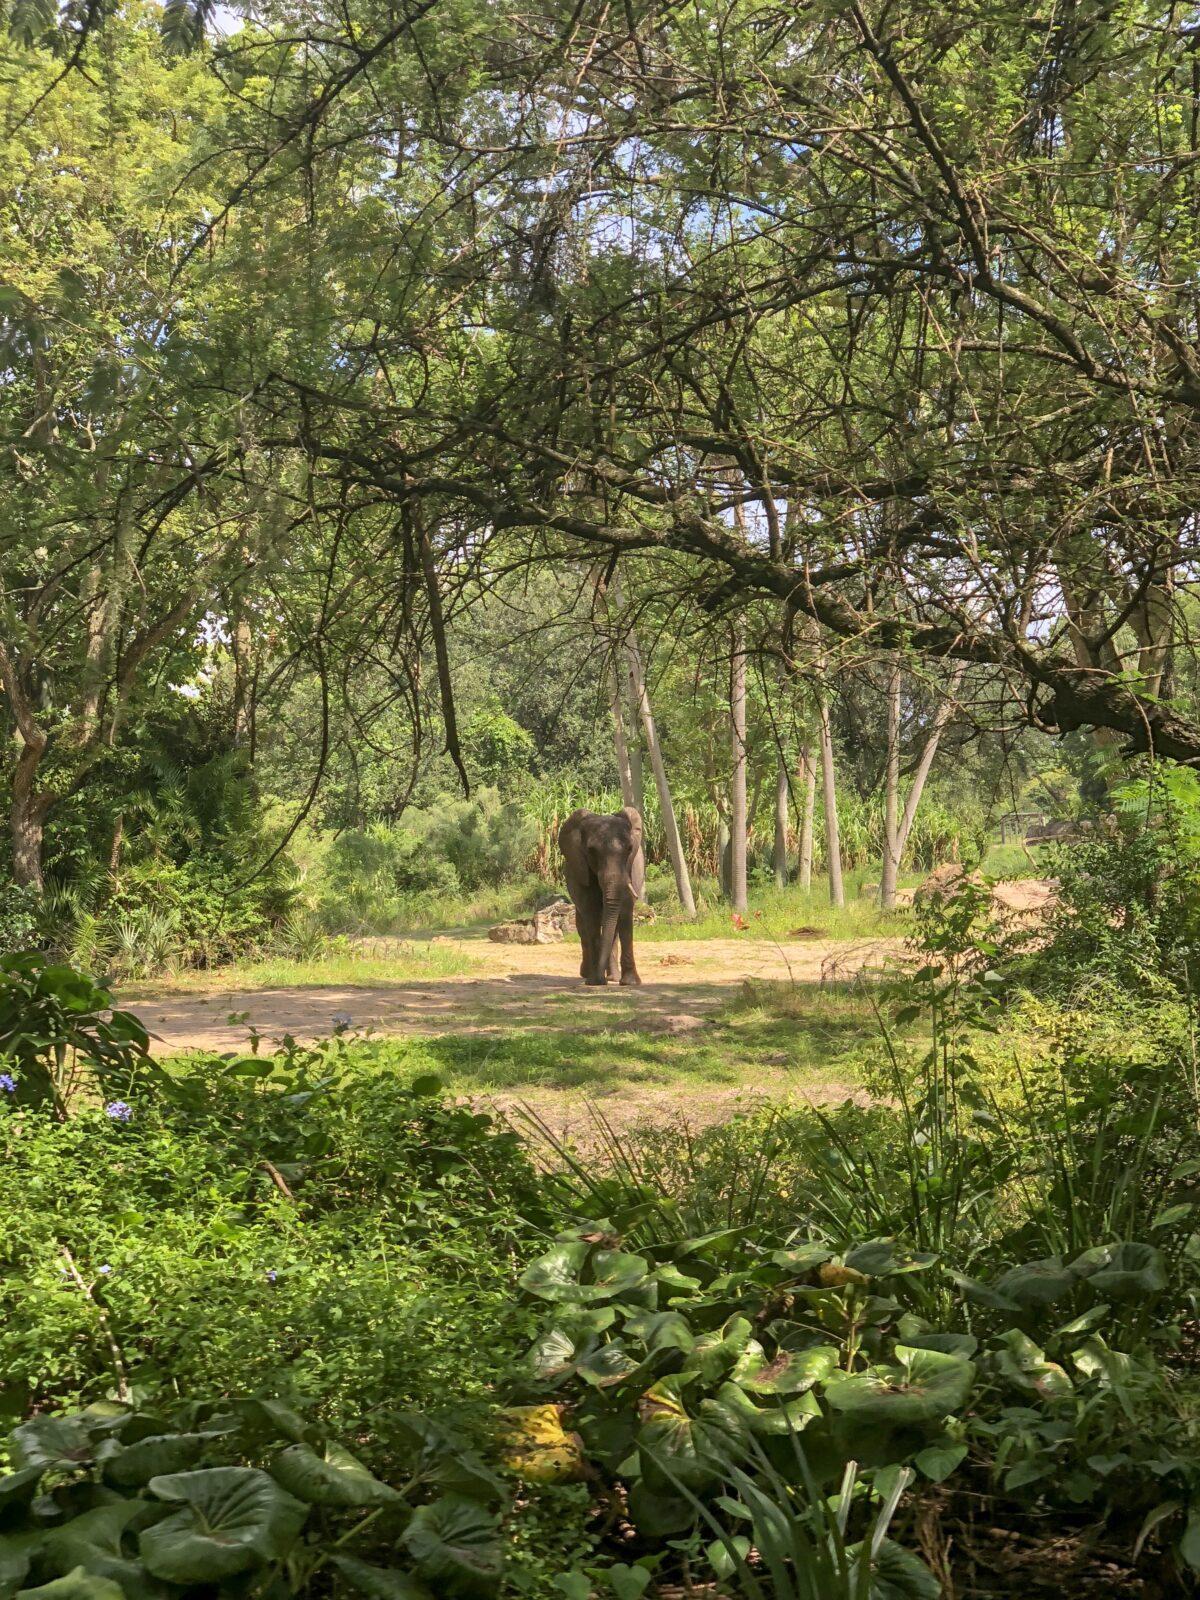 walt disney world, disney world, animal kingdom, safari, kilimangaro safaris, walt disney world in one day